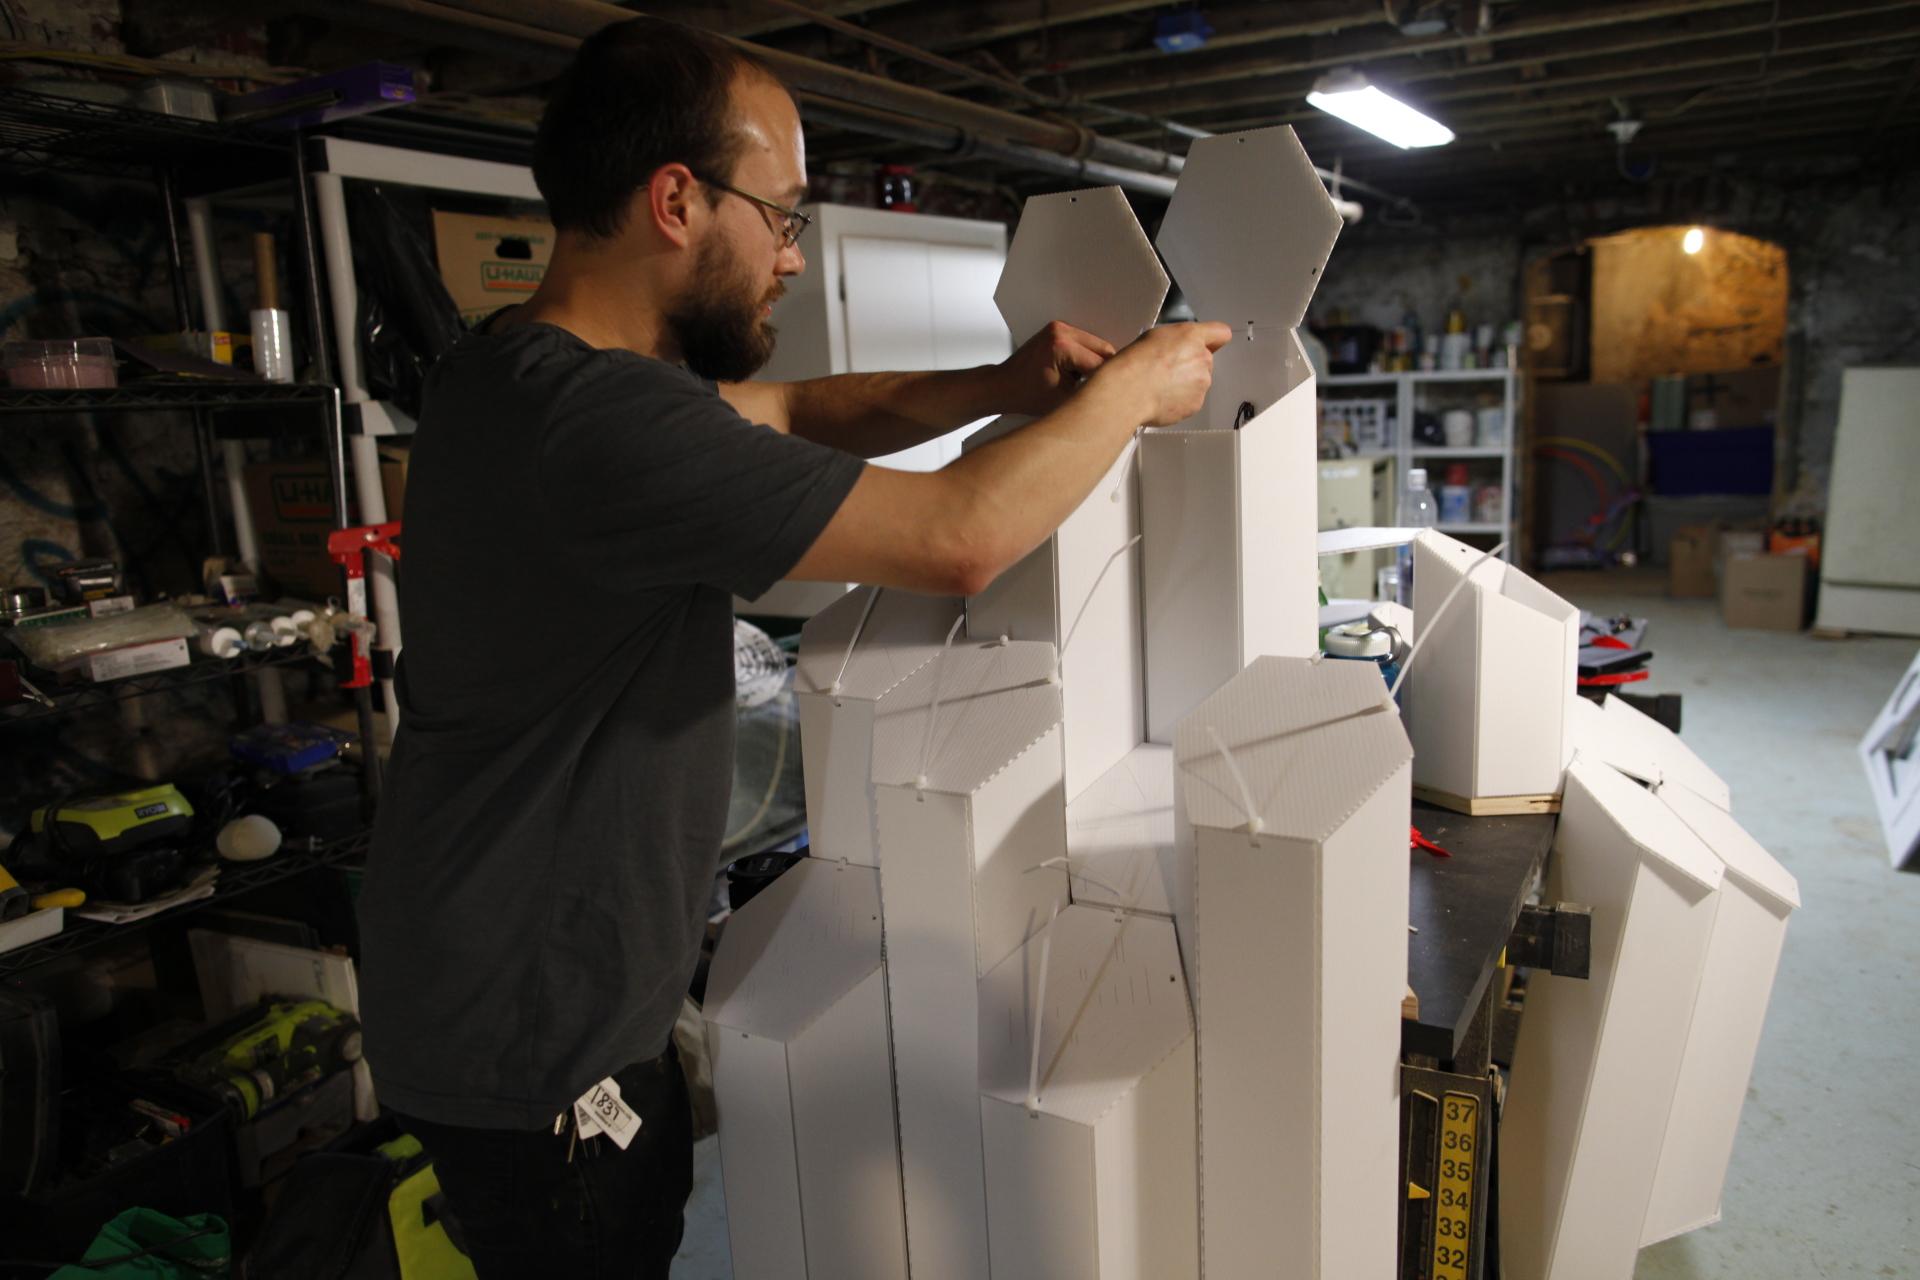 hex.crystals art installation fabrication and custom design